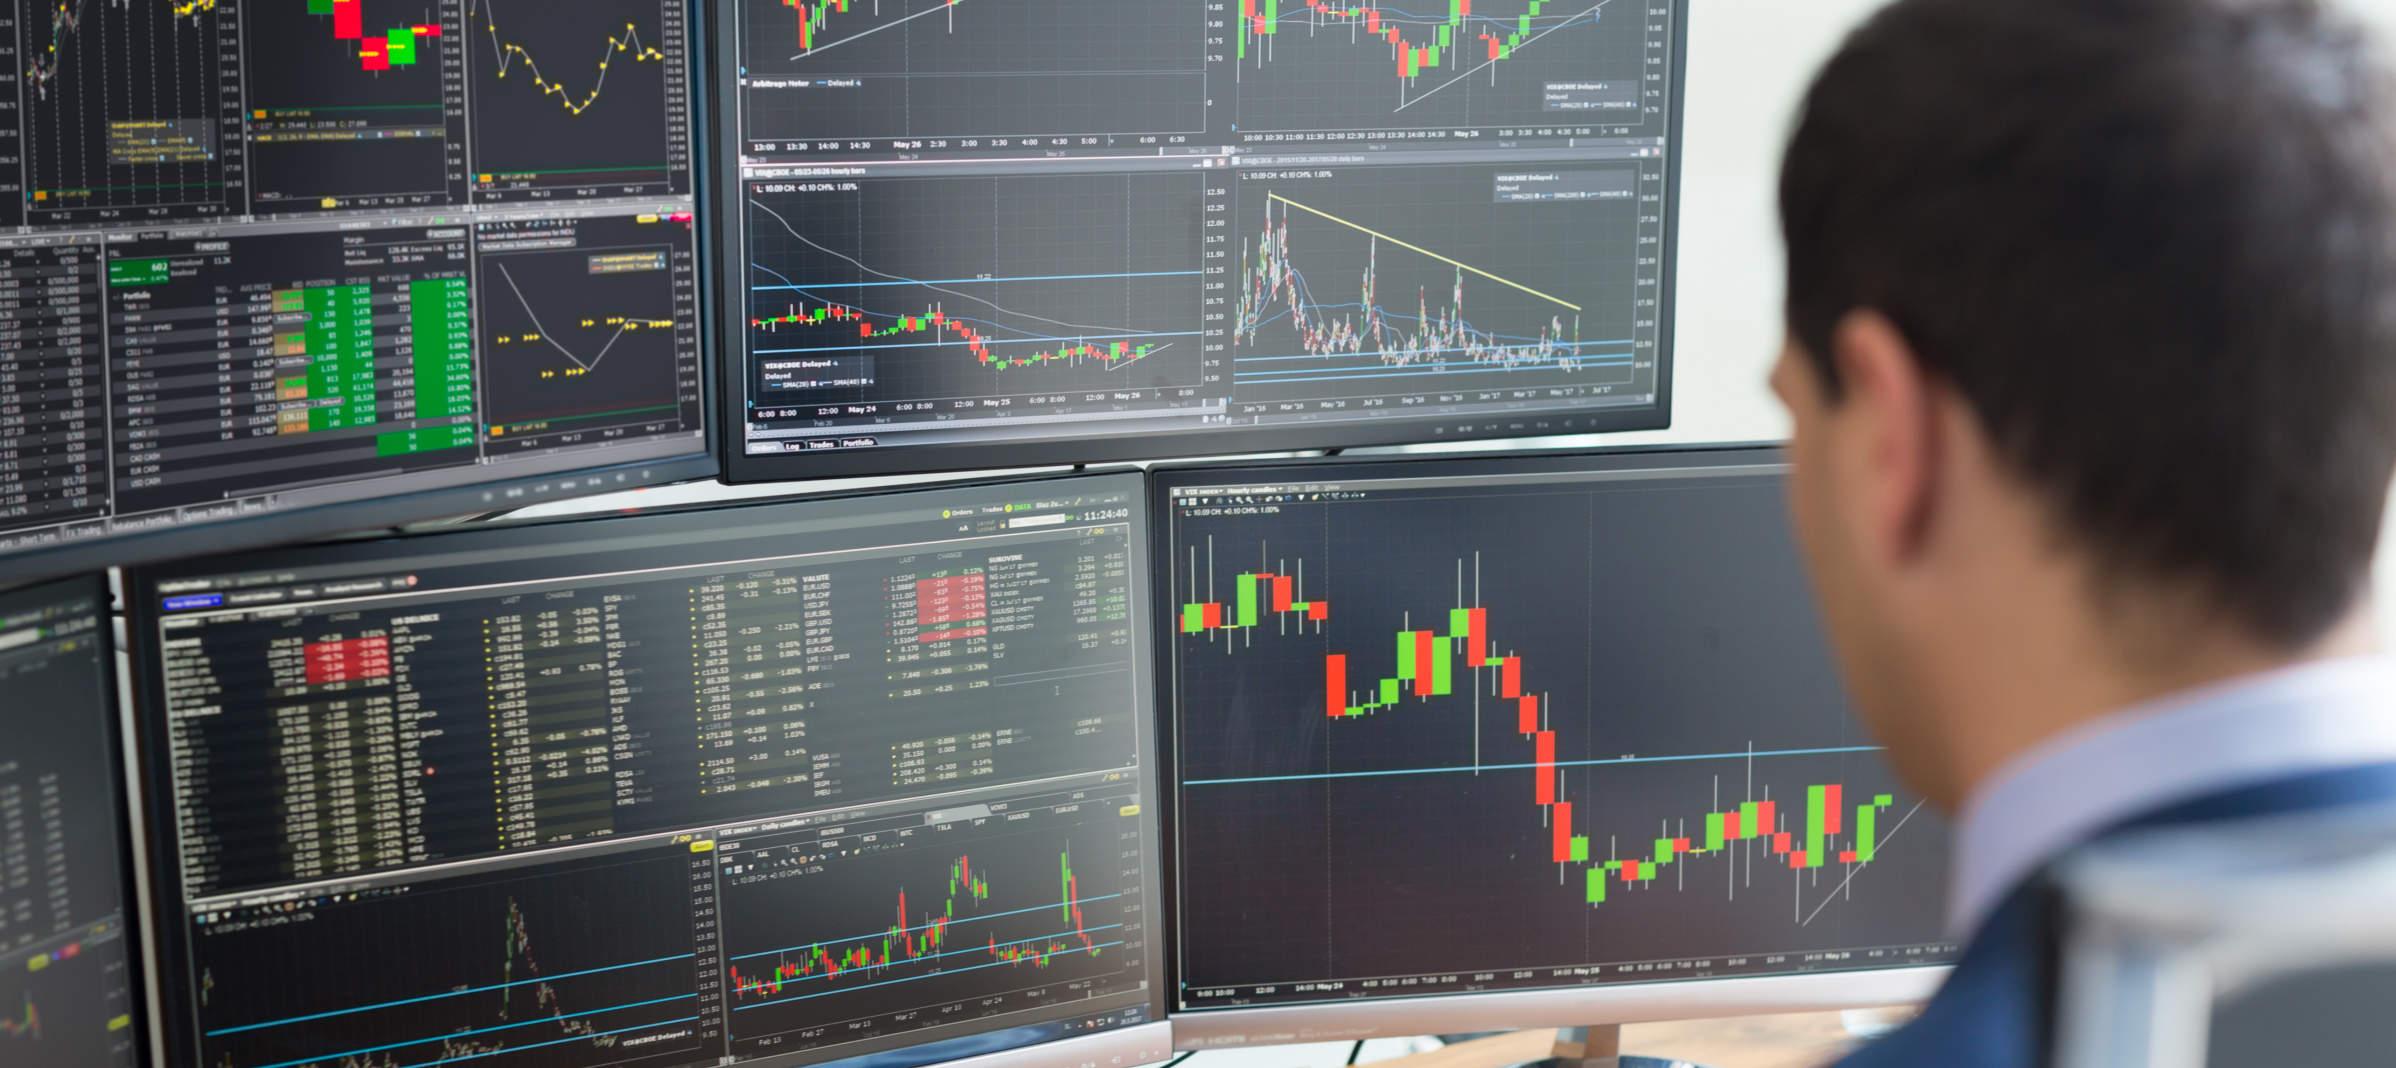 Está na hora de comprar ou vender Bitcoin? Veja a análise